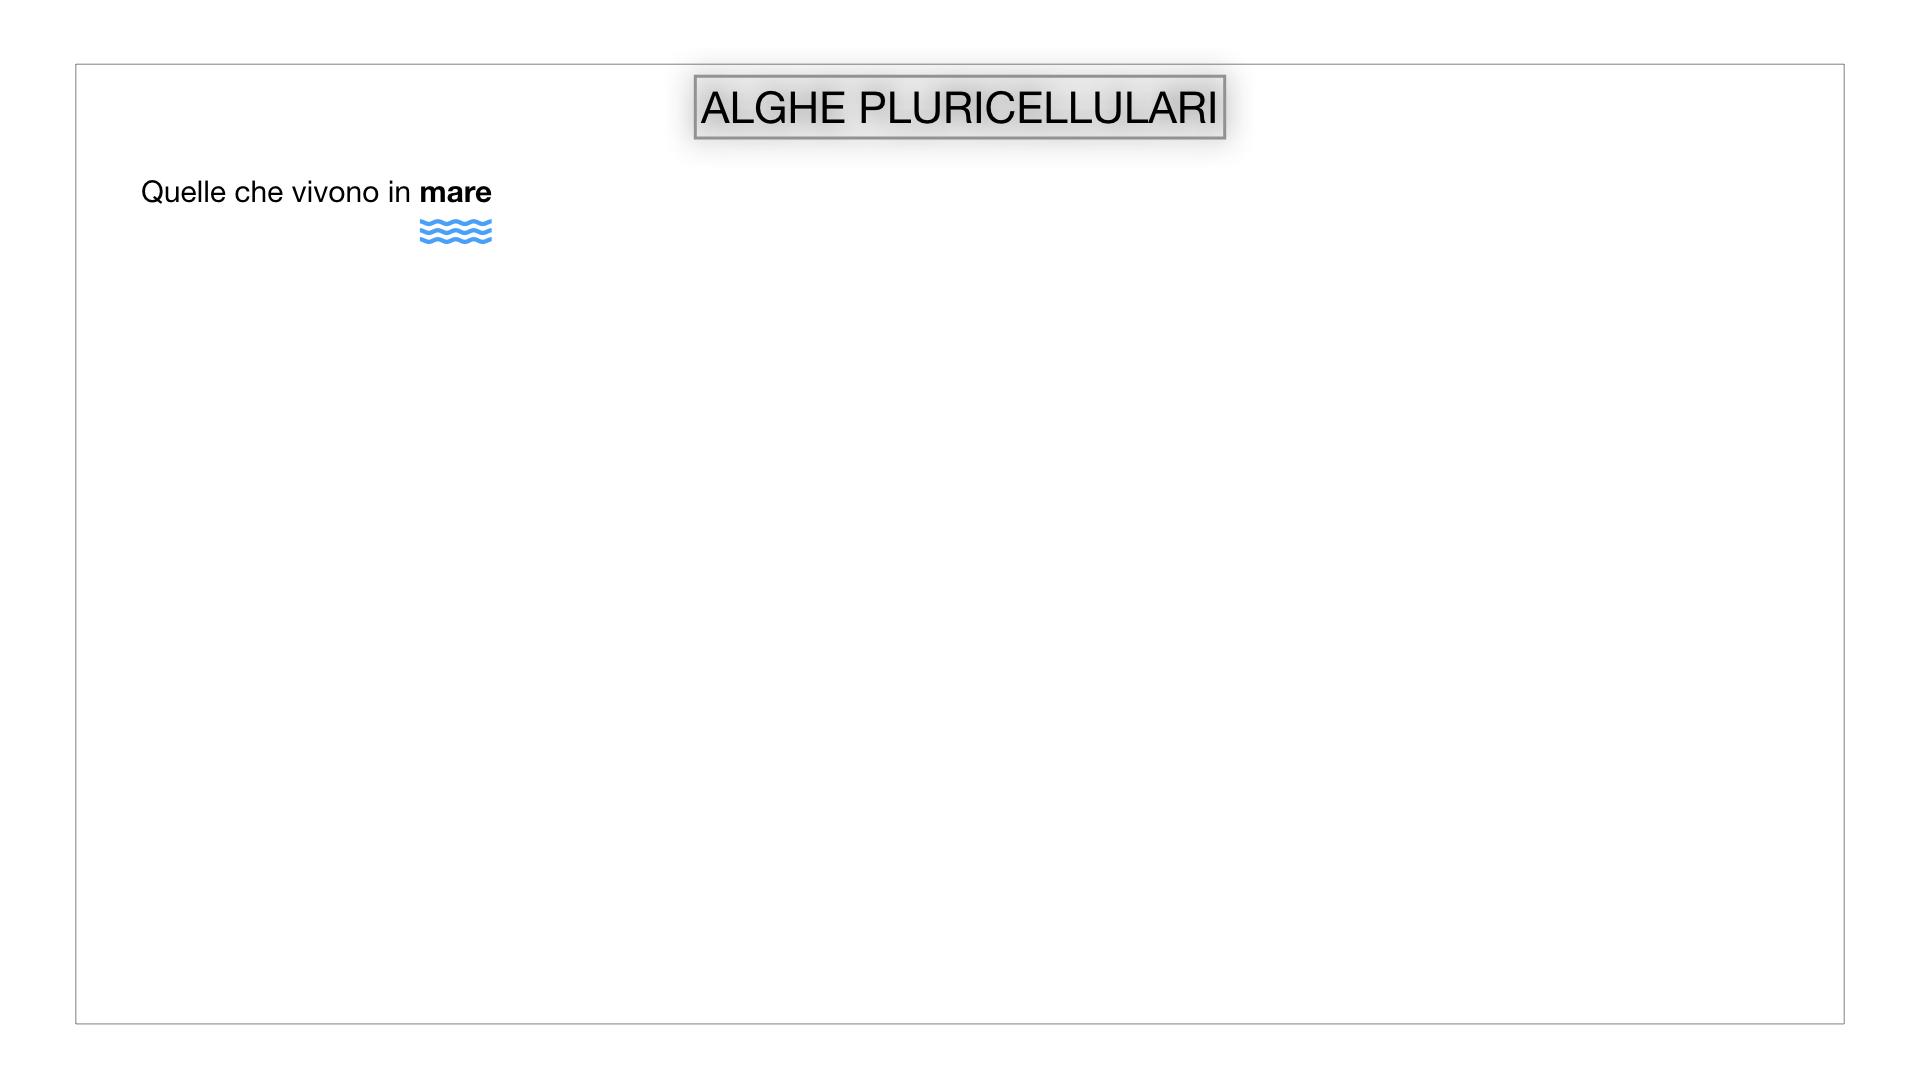 8. alghe uni_pluri_cellulari_SIMULAZIONE.031